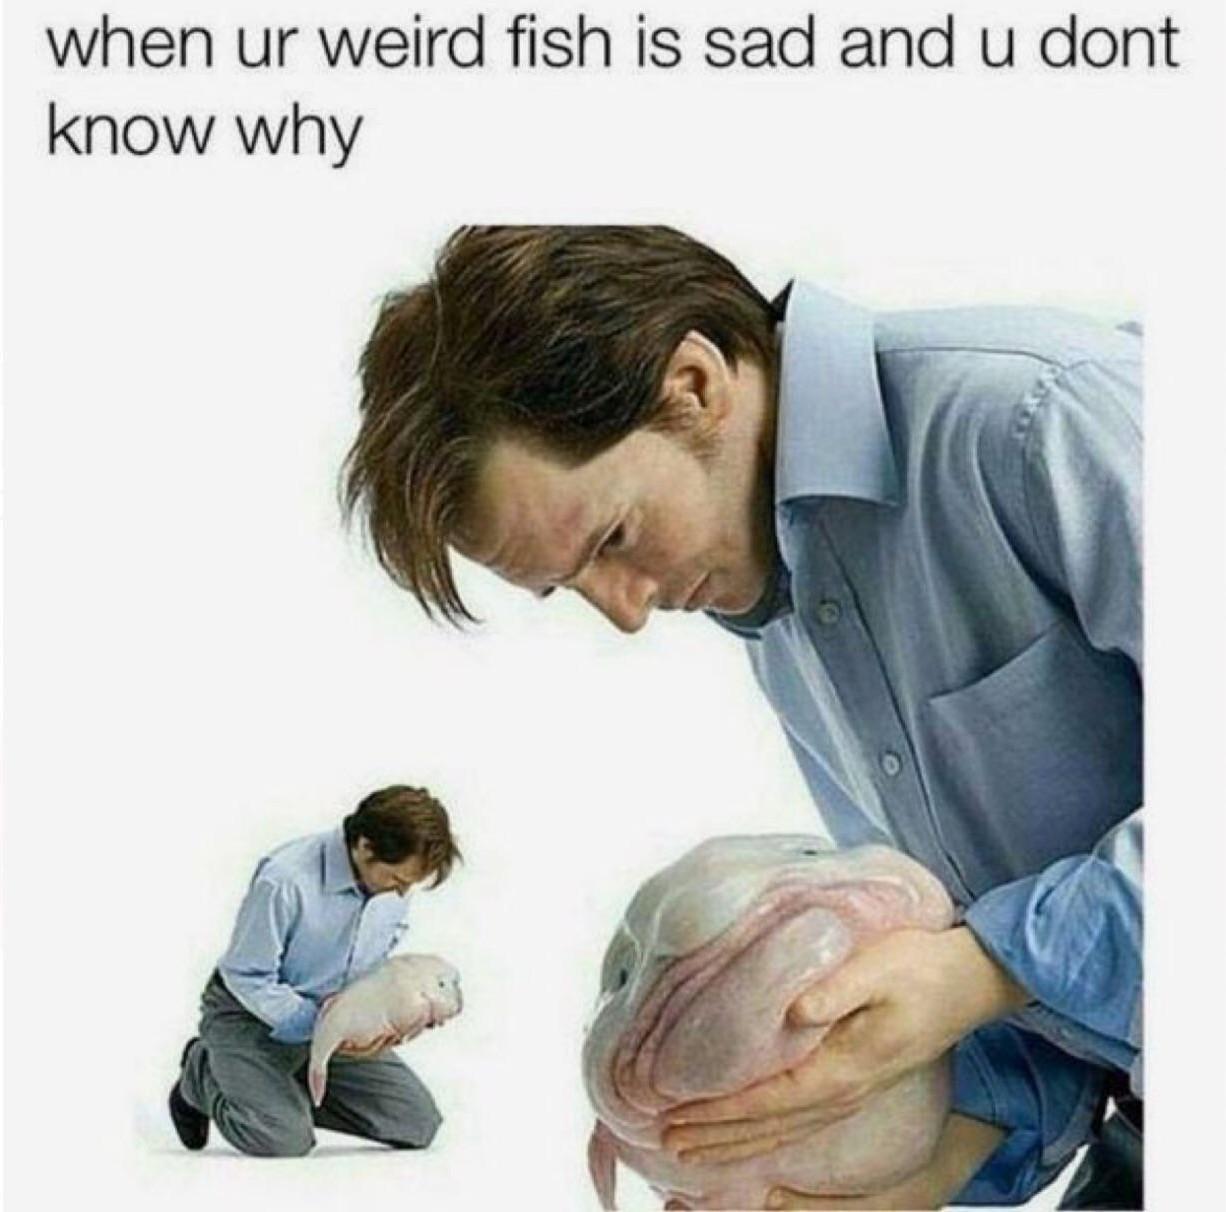 Trad: Quand ton Blooby est triste mais que tu ne sais pas pourquoi - meme